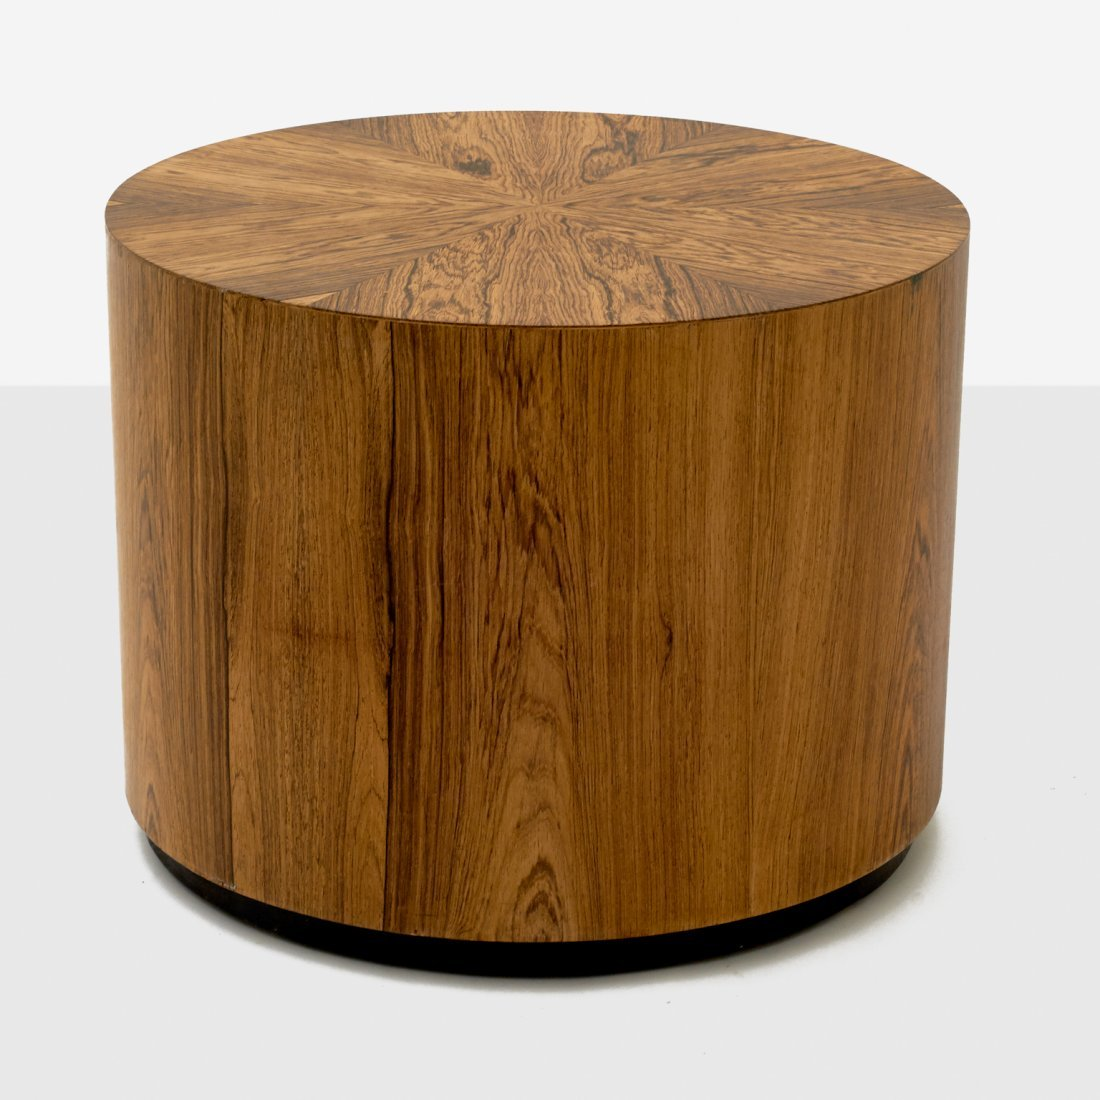 Harvey Probber, Drum Side Table